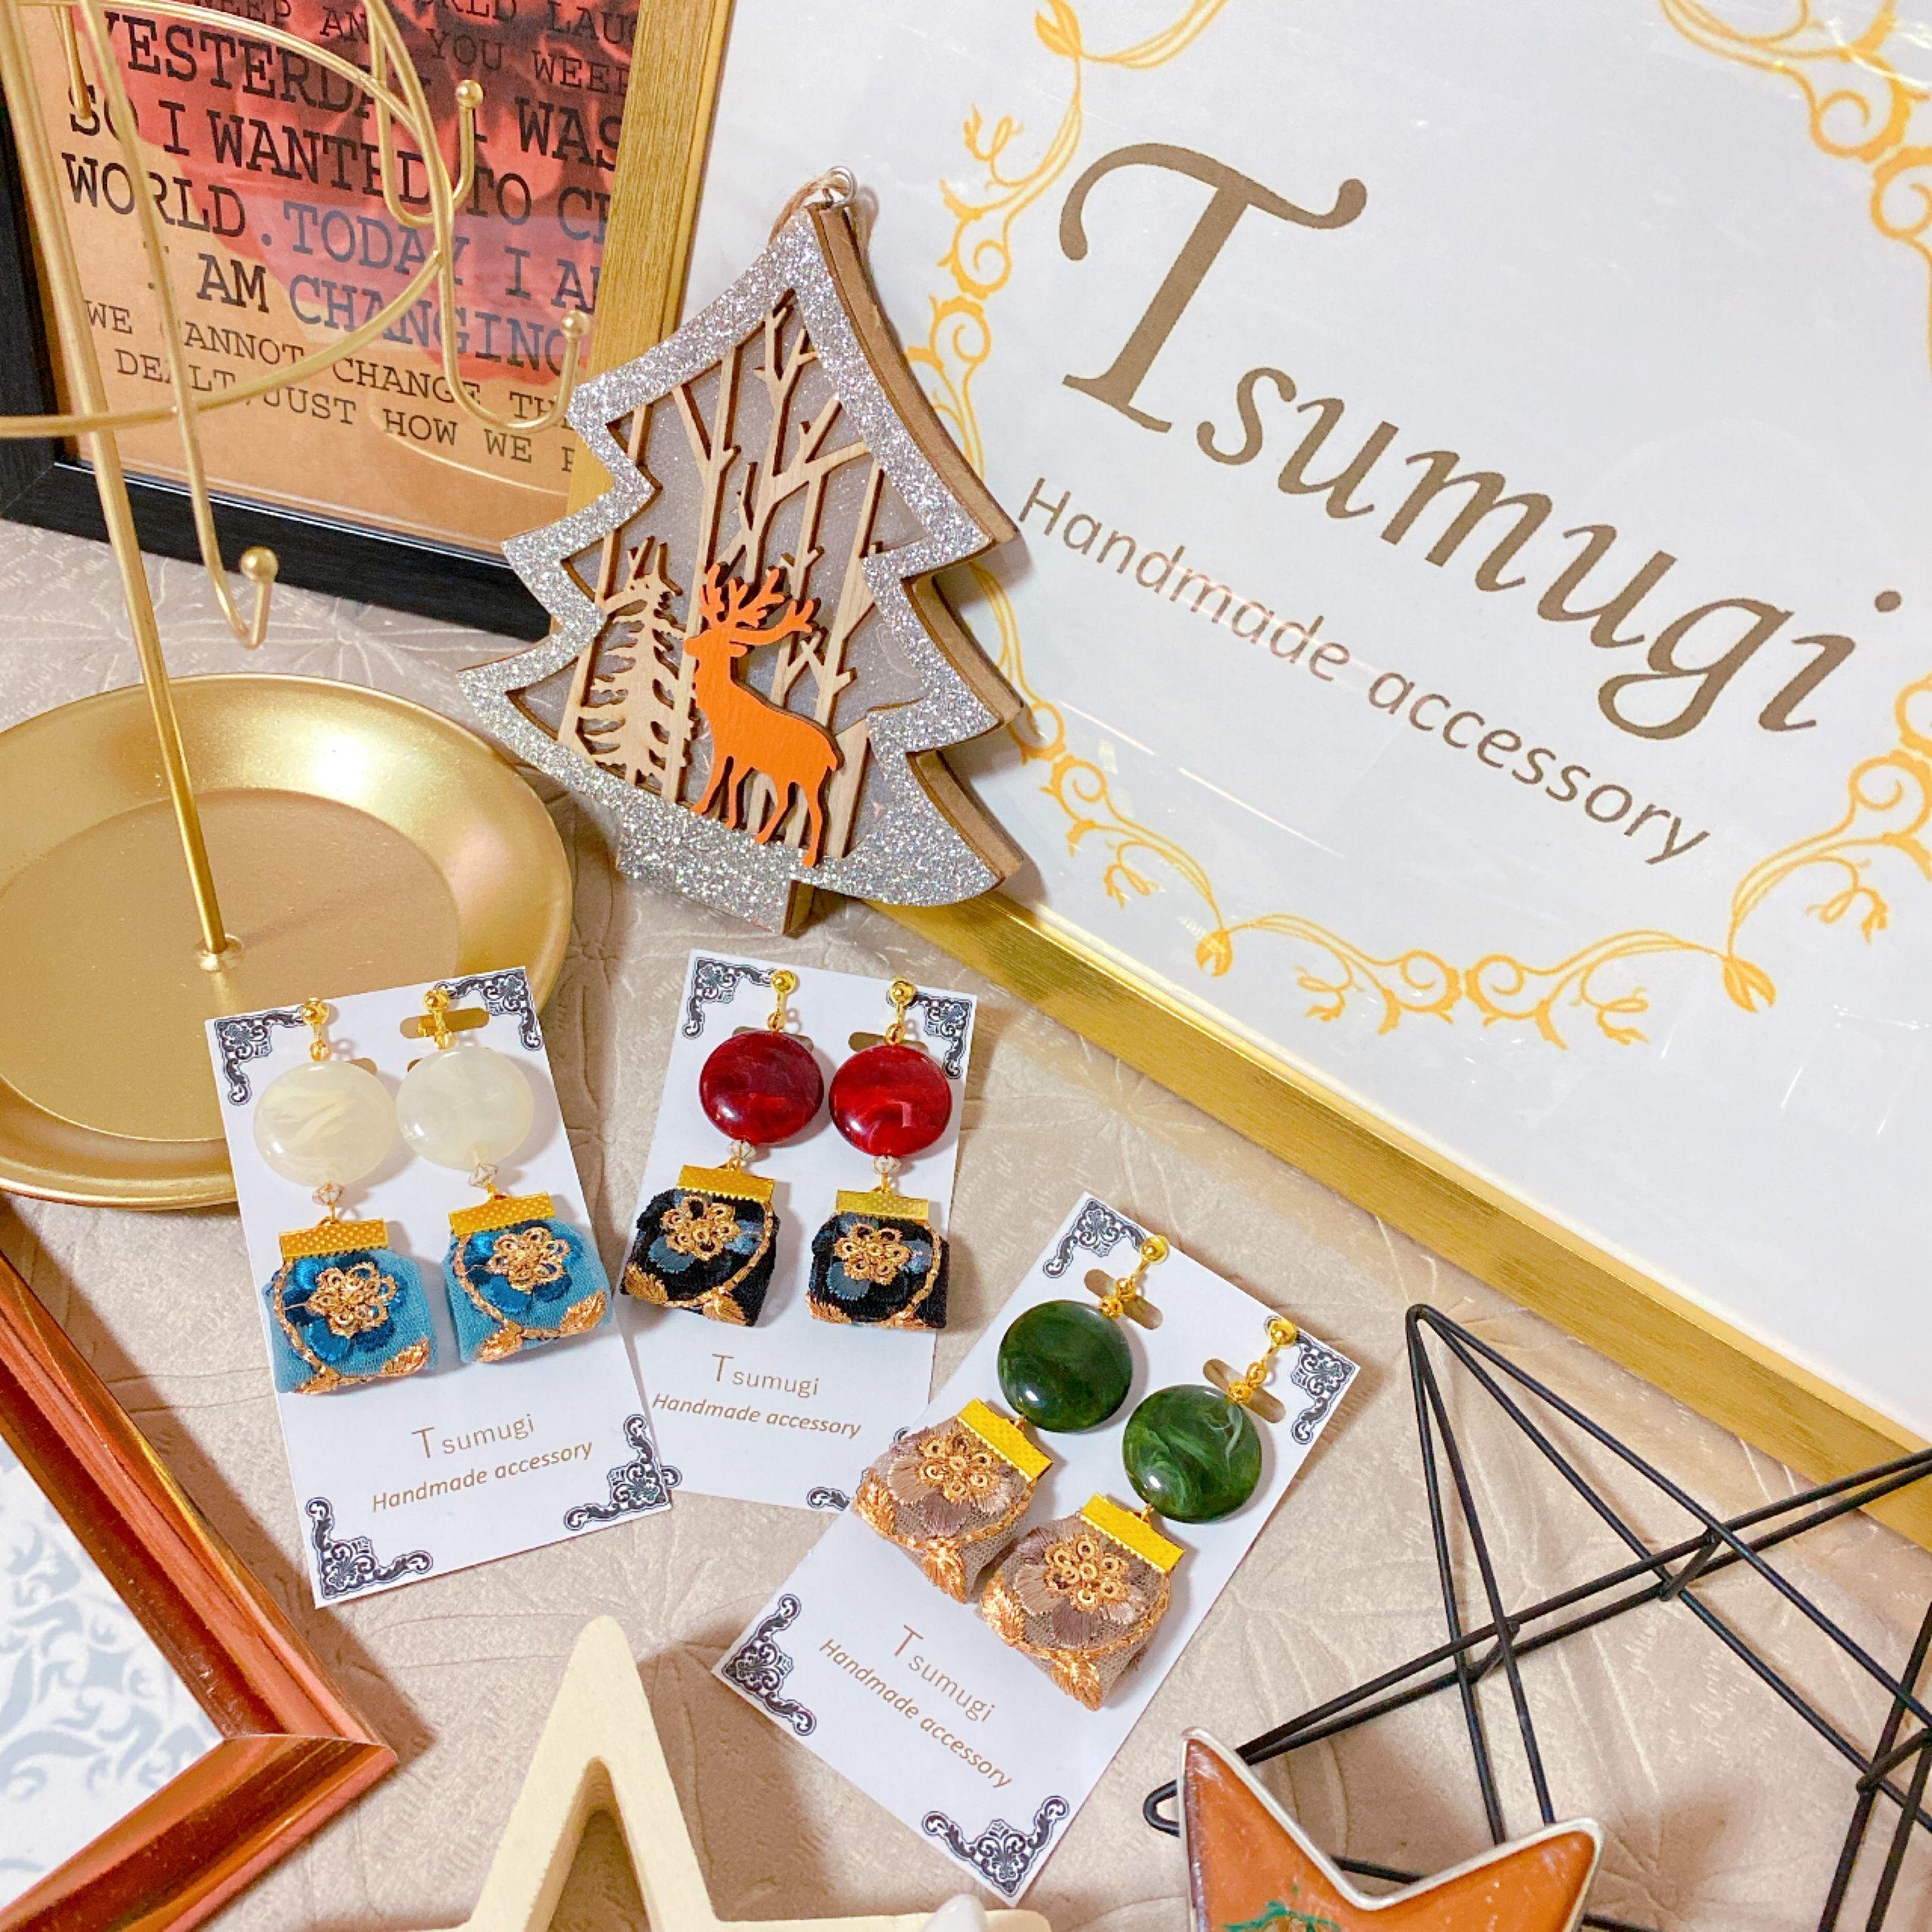 -Tsumugi-handmade accessory.山野流着付け教室.出張着付け.ワークショップ.イベント出店.つまみ細工